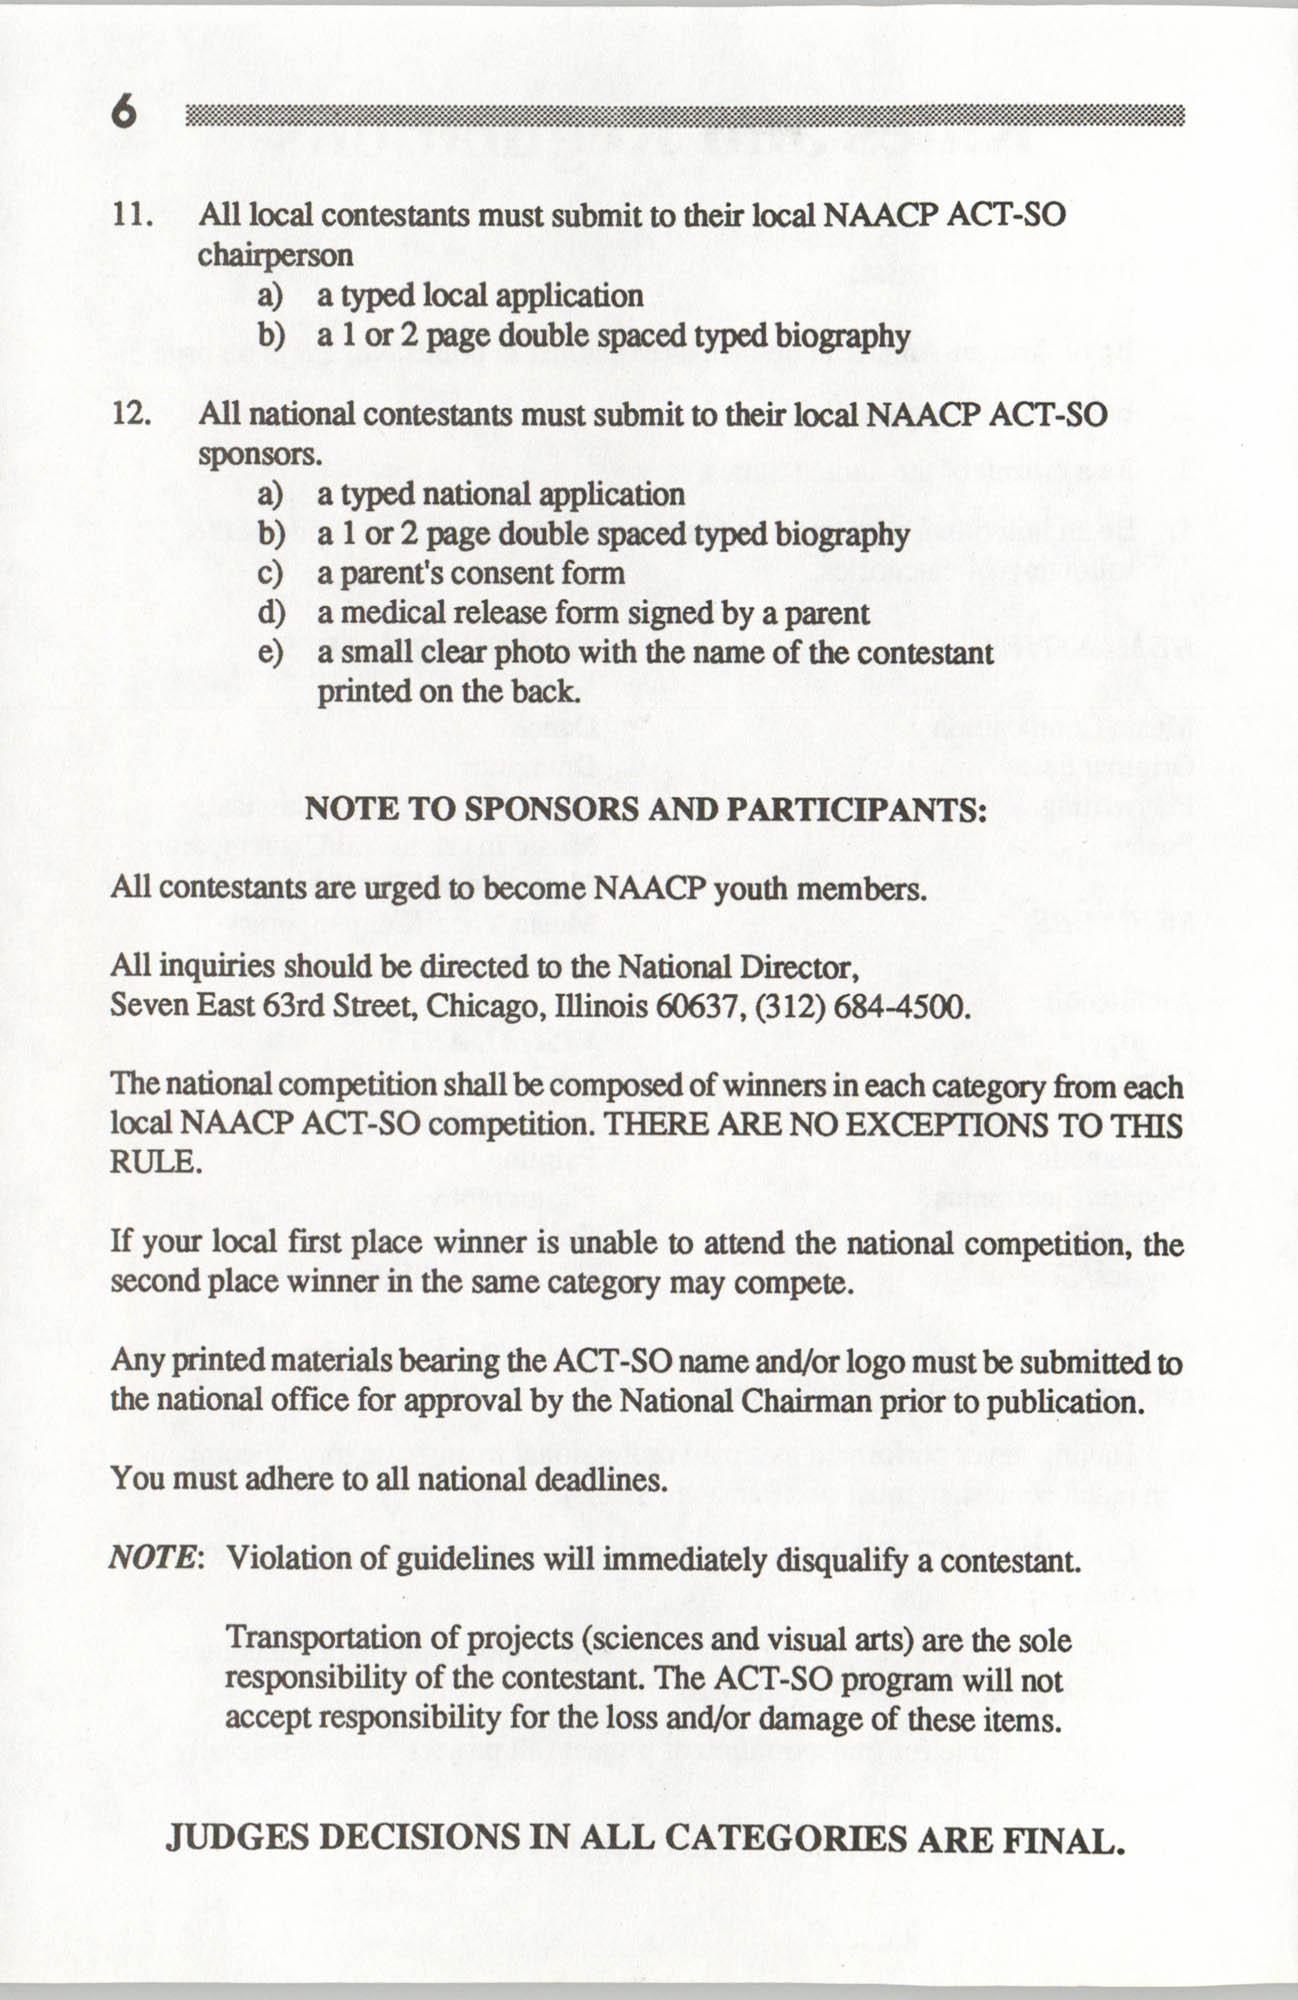 Brochure, ACT-SO Program, NAACP, 1992, Page 6